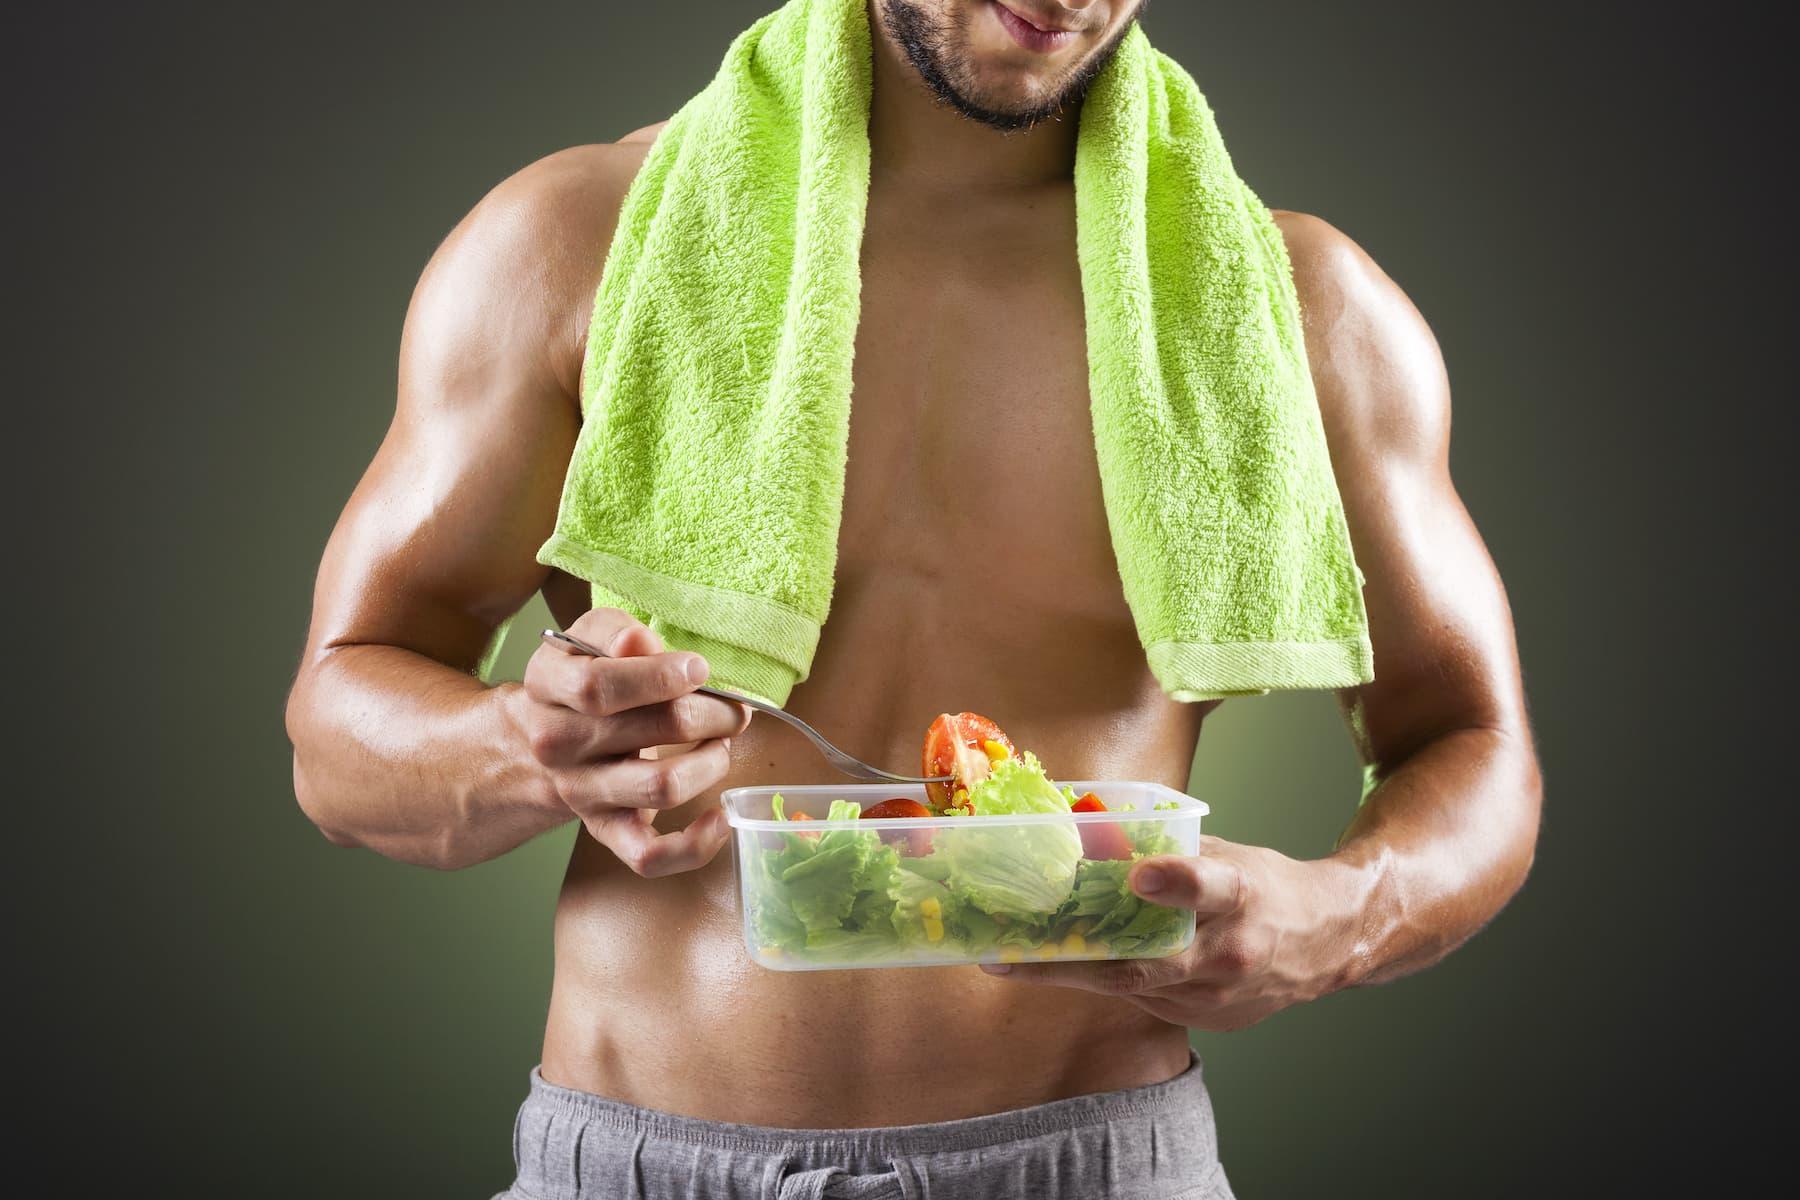 Dieta wegetariańska a trening. Czy to ma sens?